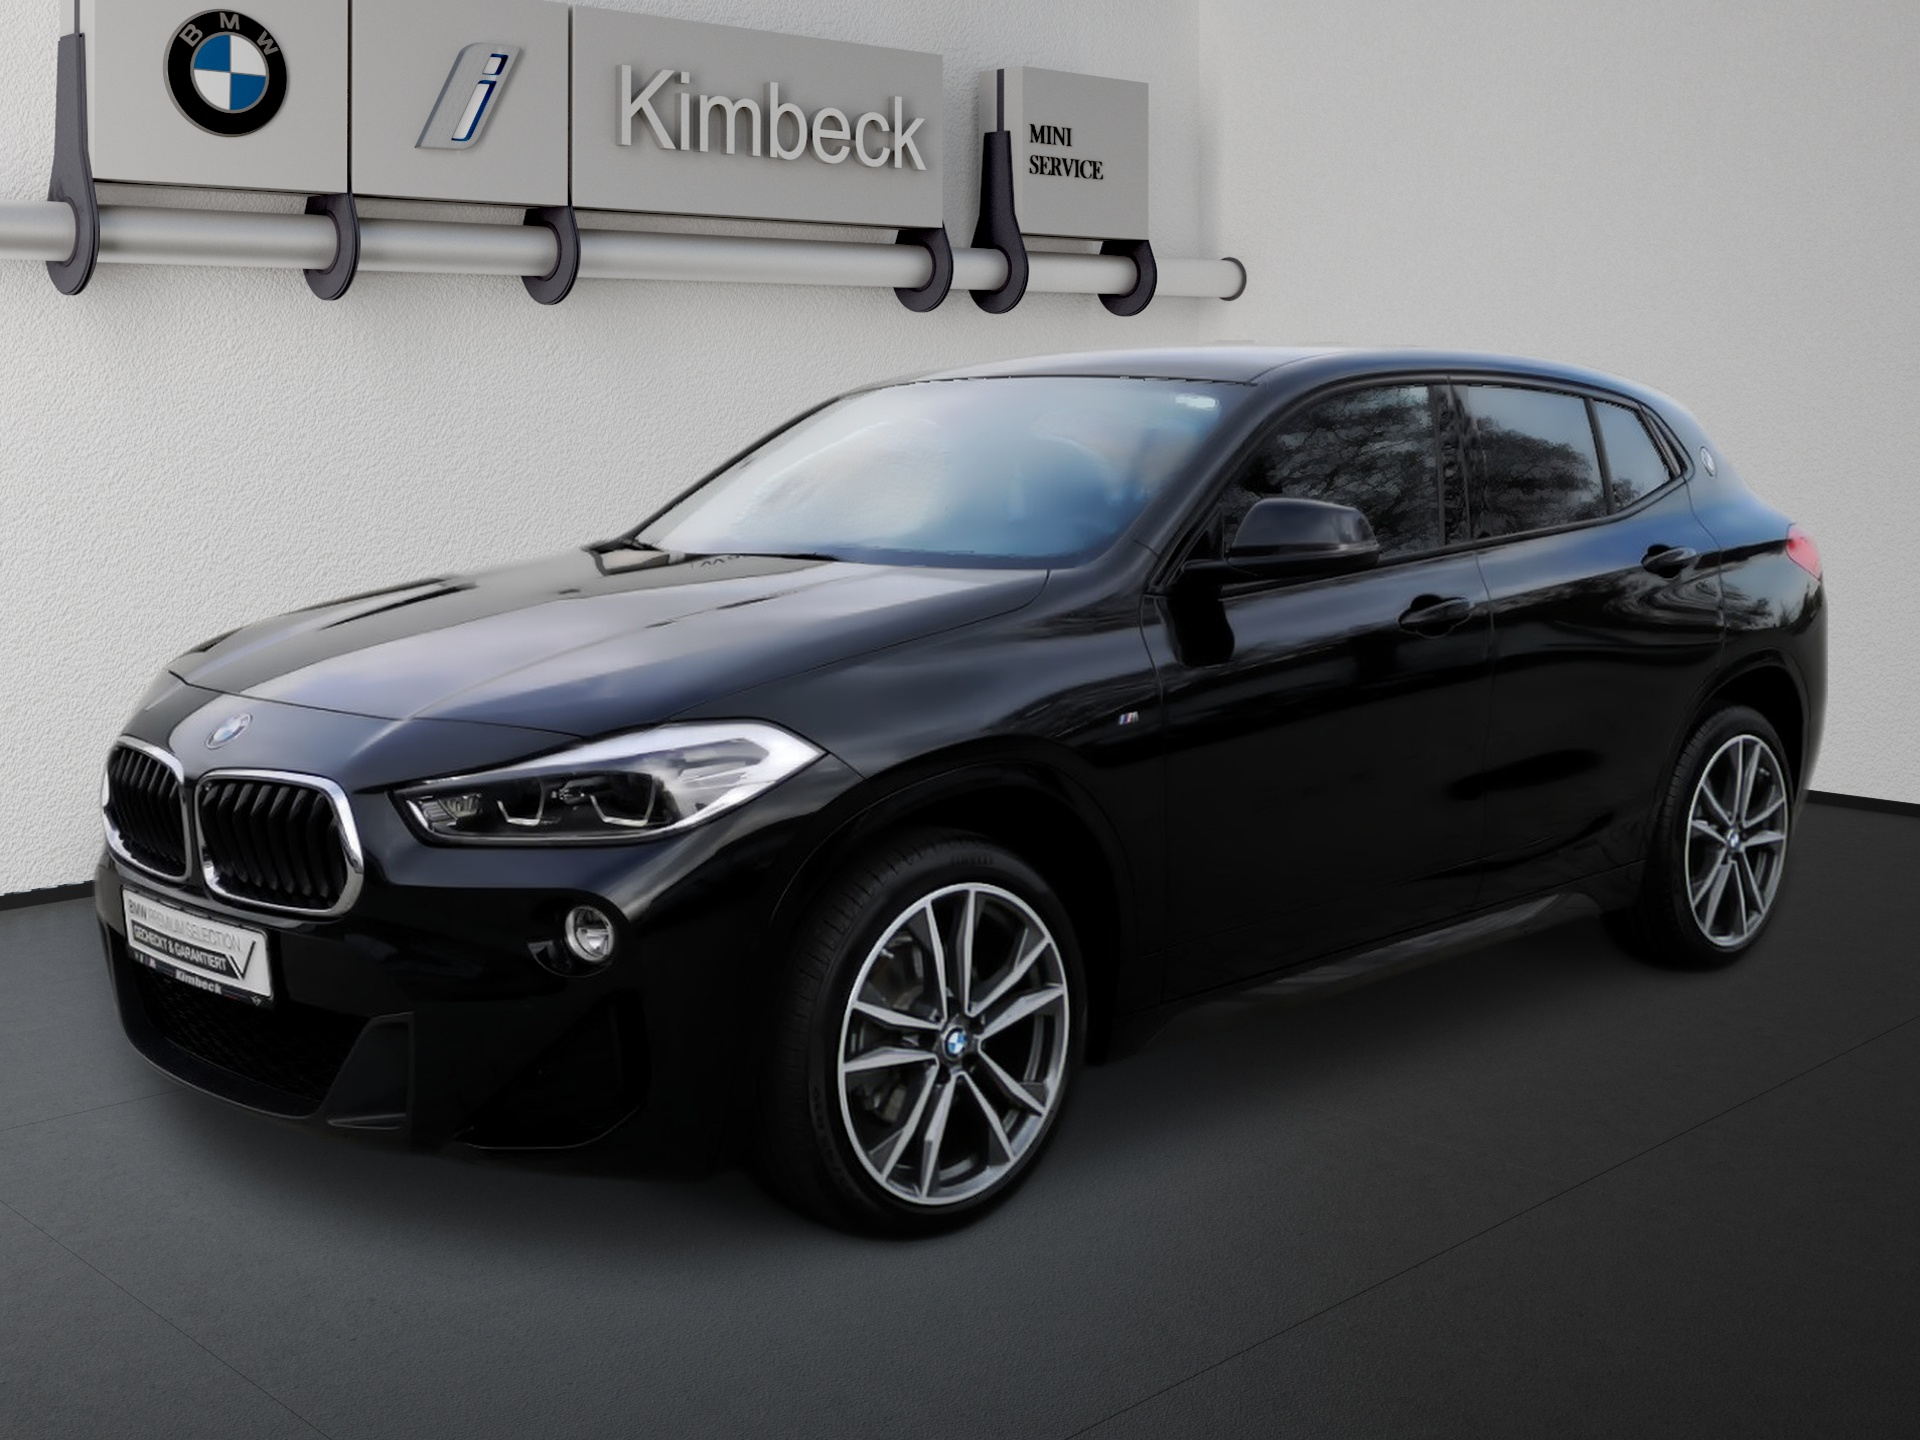 BMW X2 sDrive18d M SPORT Navi LED AHK DrivingAss., Jahr 2019, Diesel